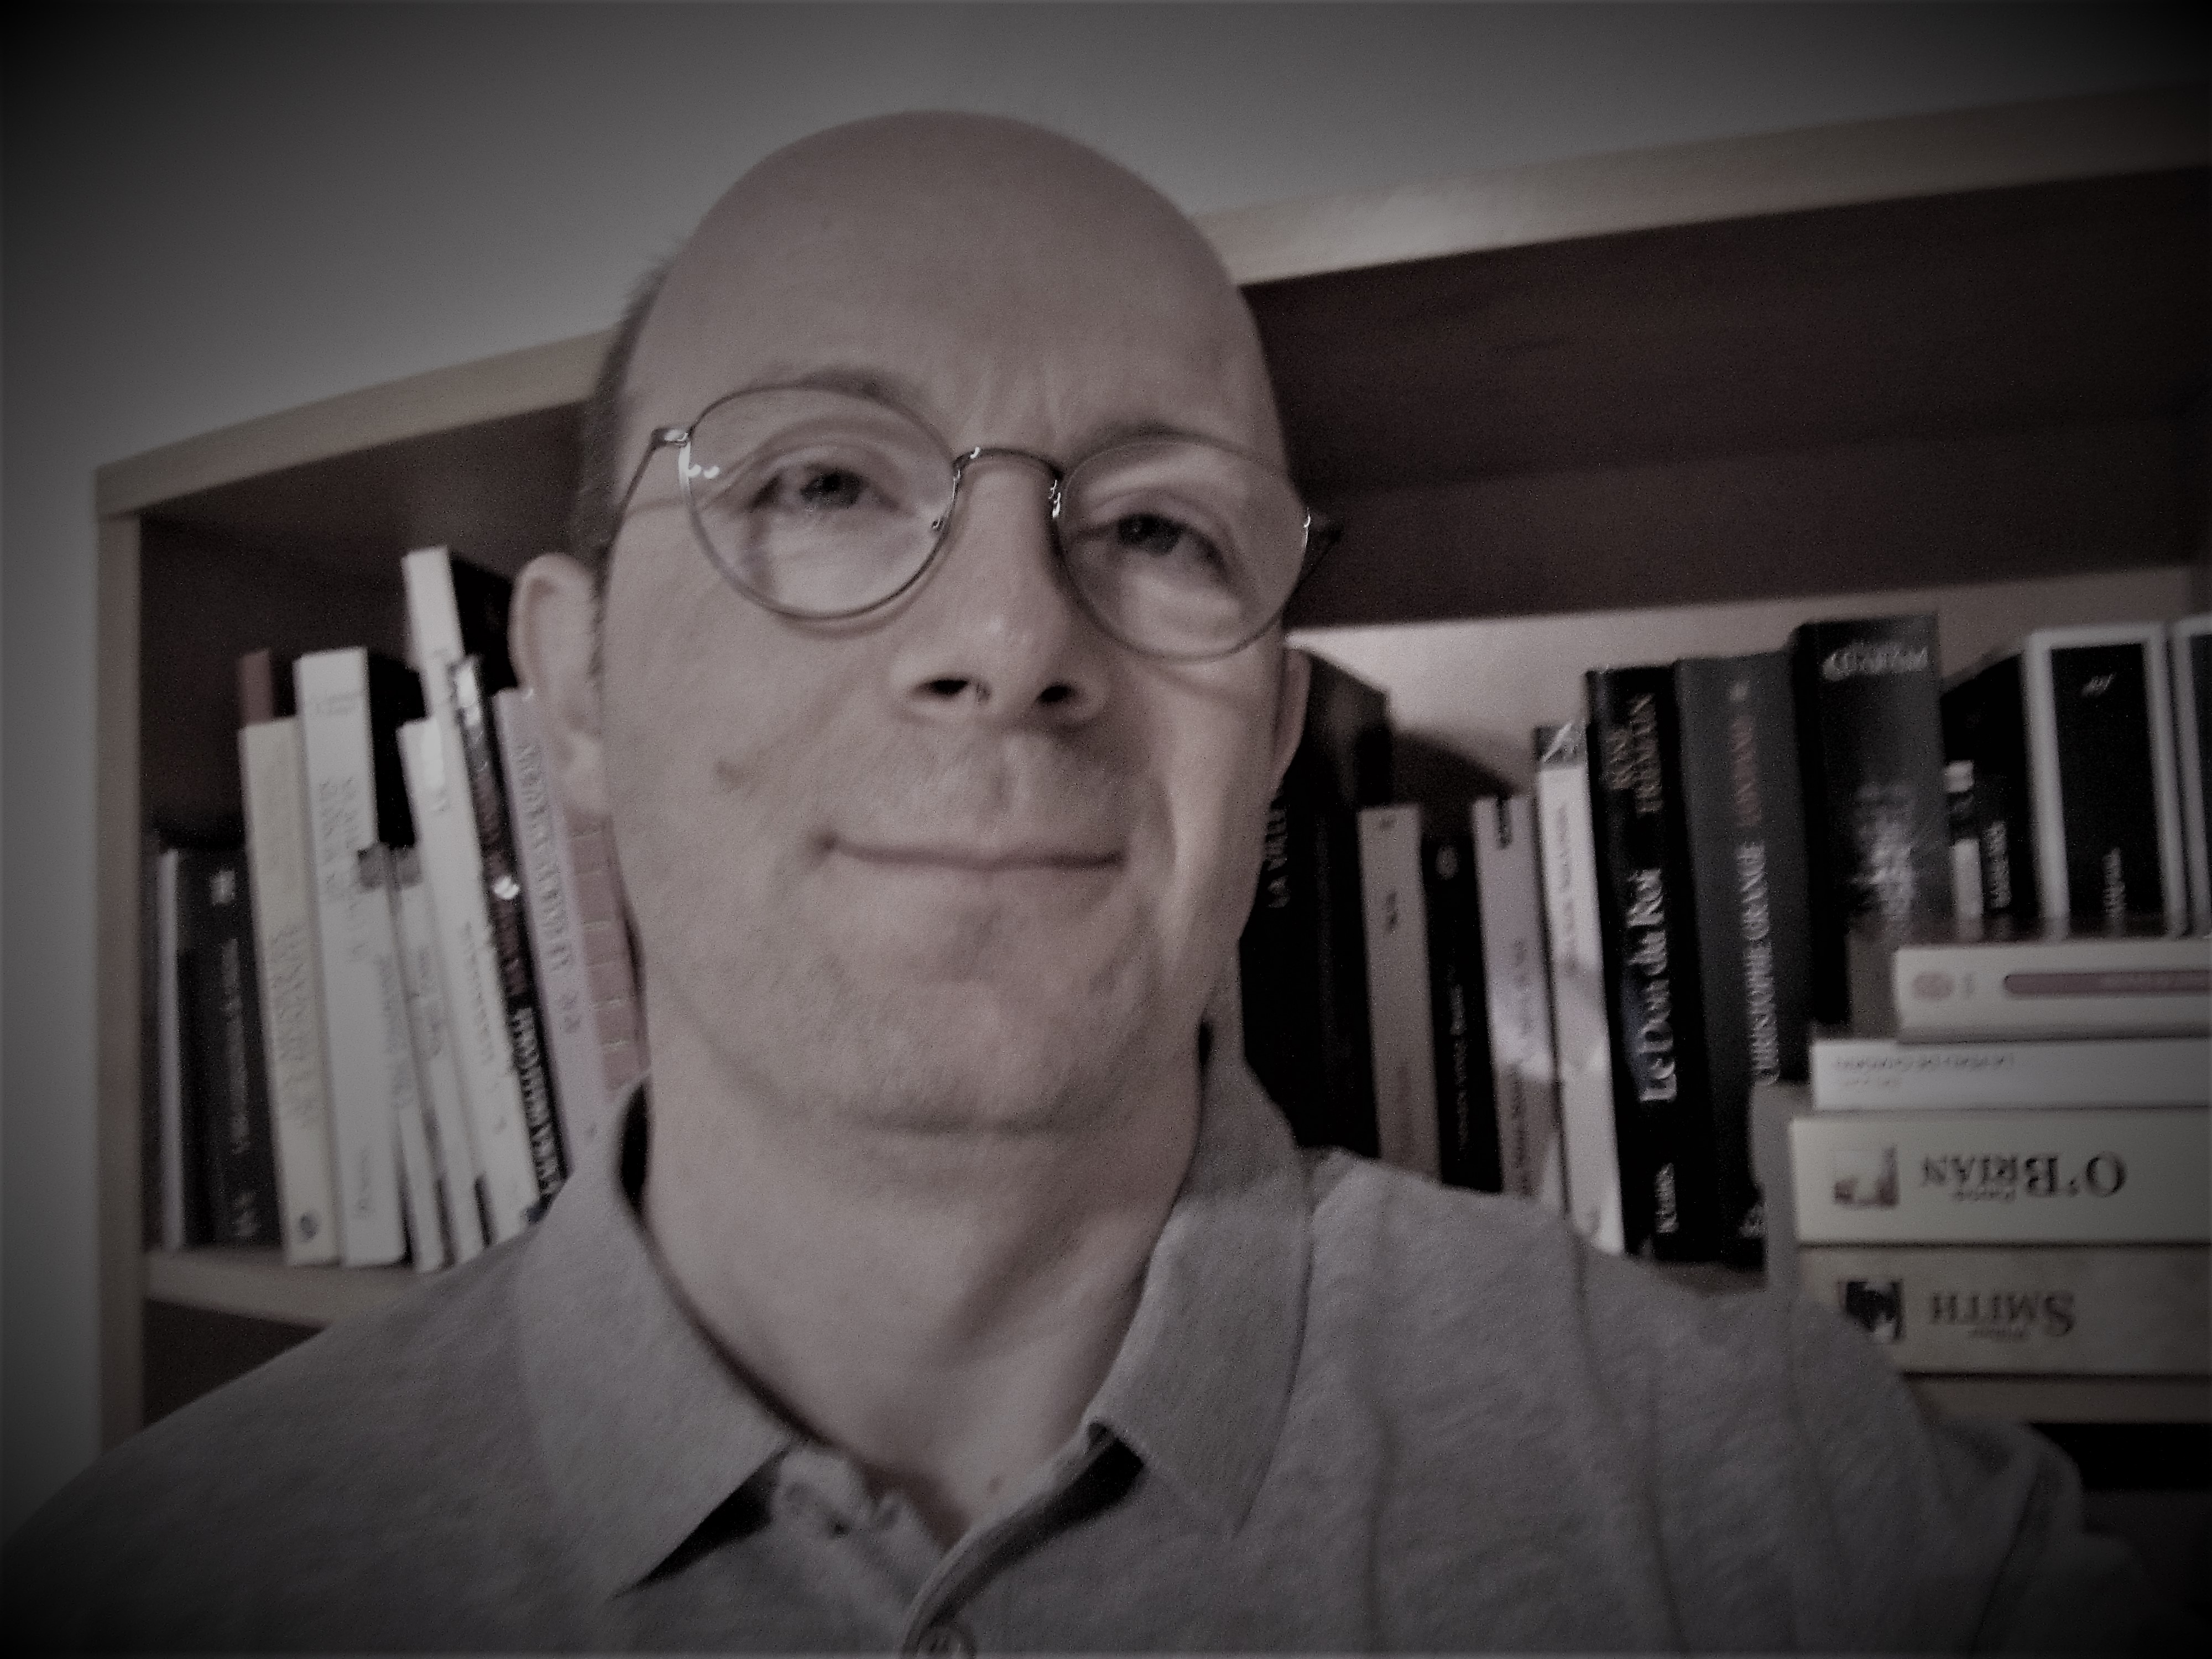 Stéphane Crolard